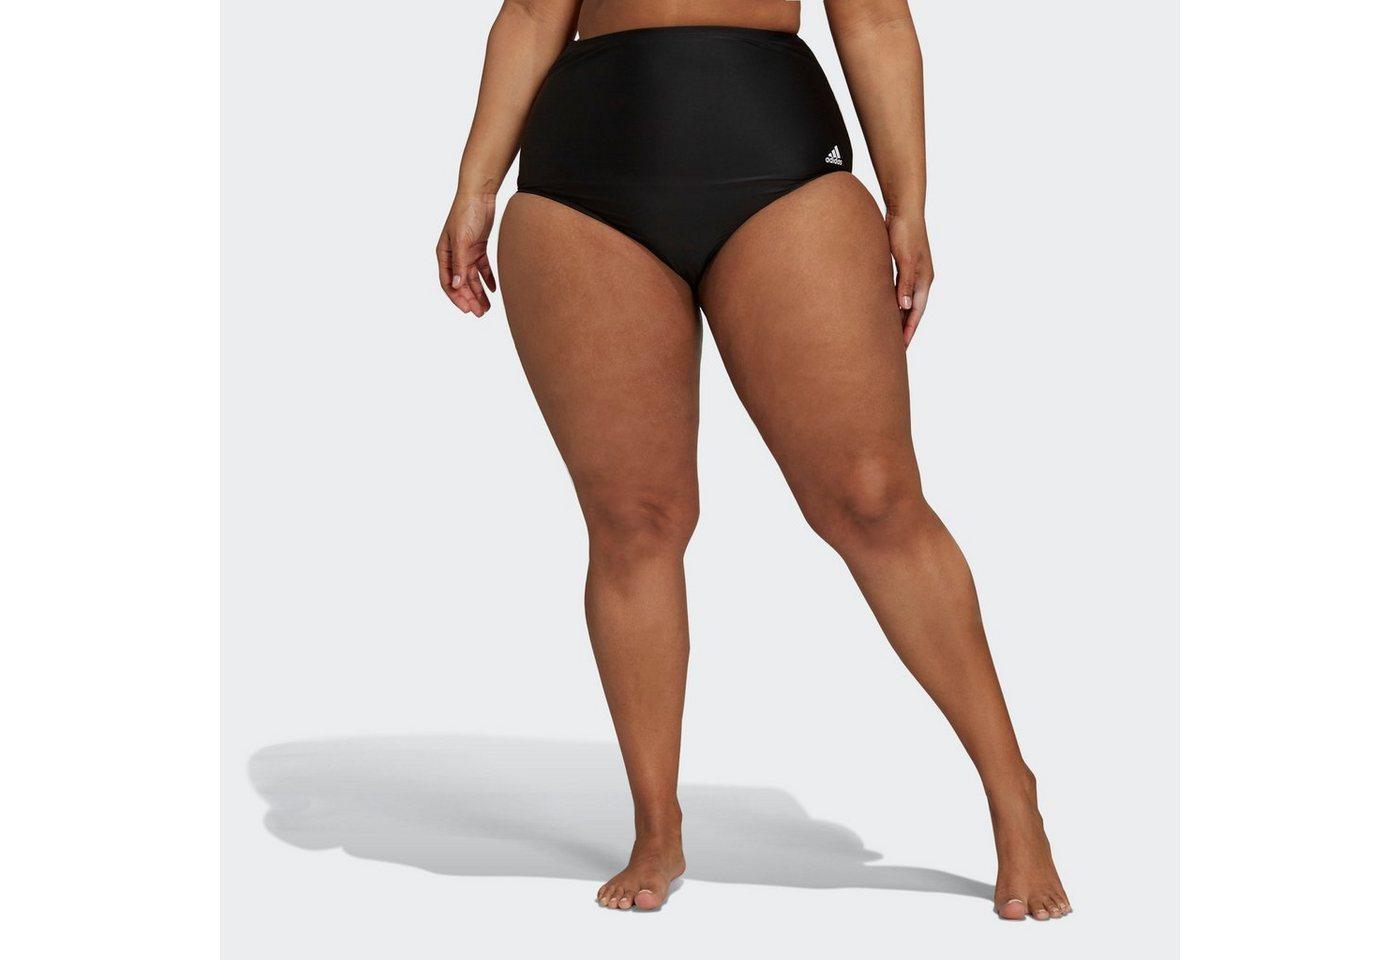 Bademode - adidas Performance Bikini Hose »SH3.RO Tankini Bikinihose – Große Größen« ›  - Onlineshop OTTO